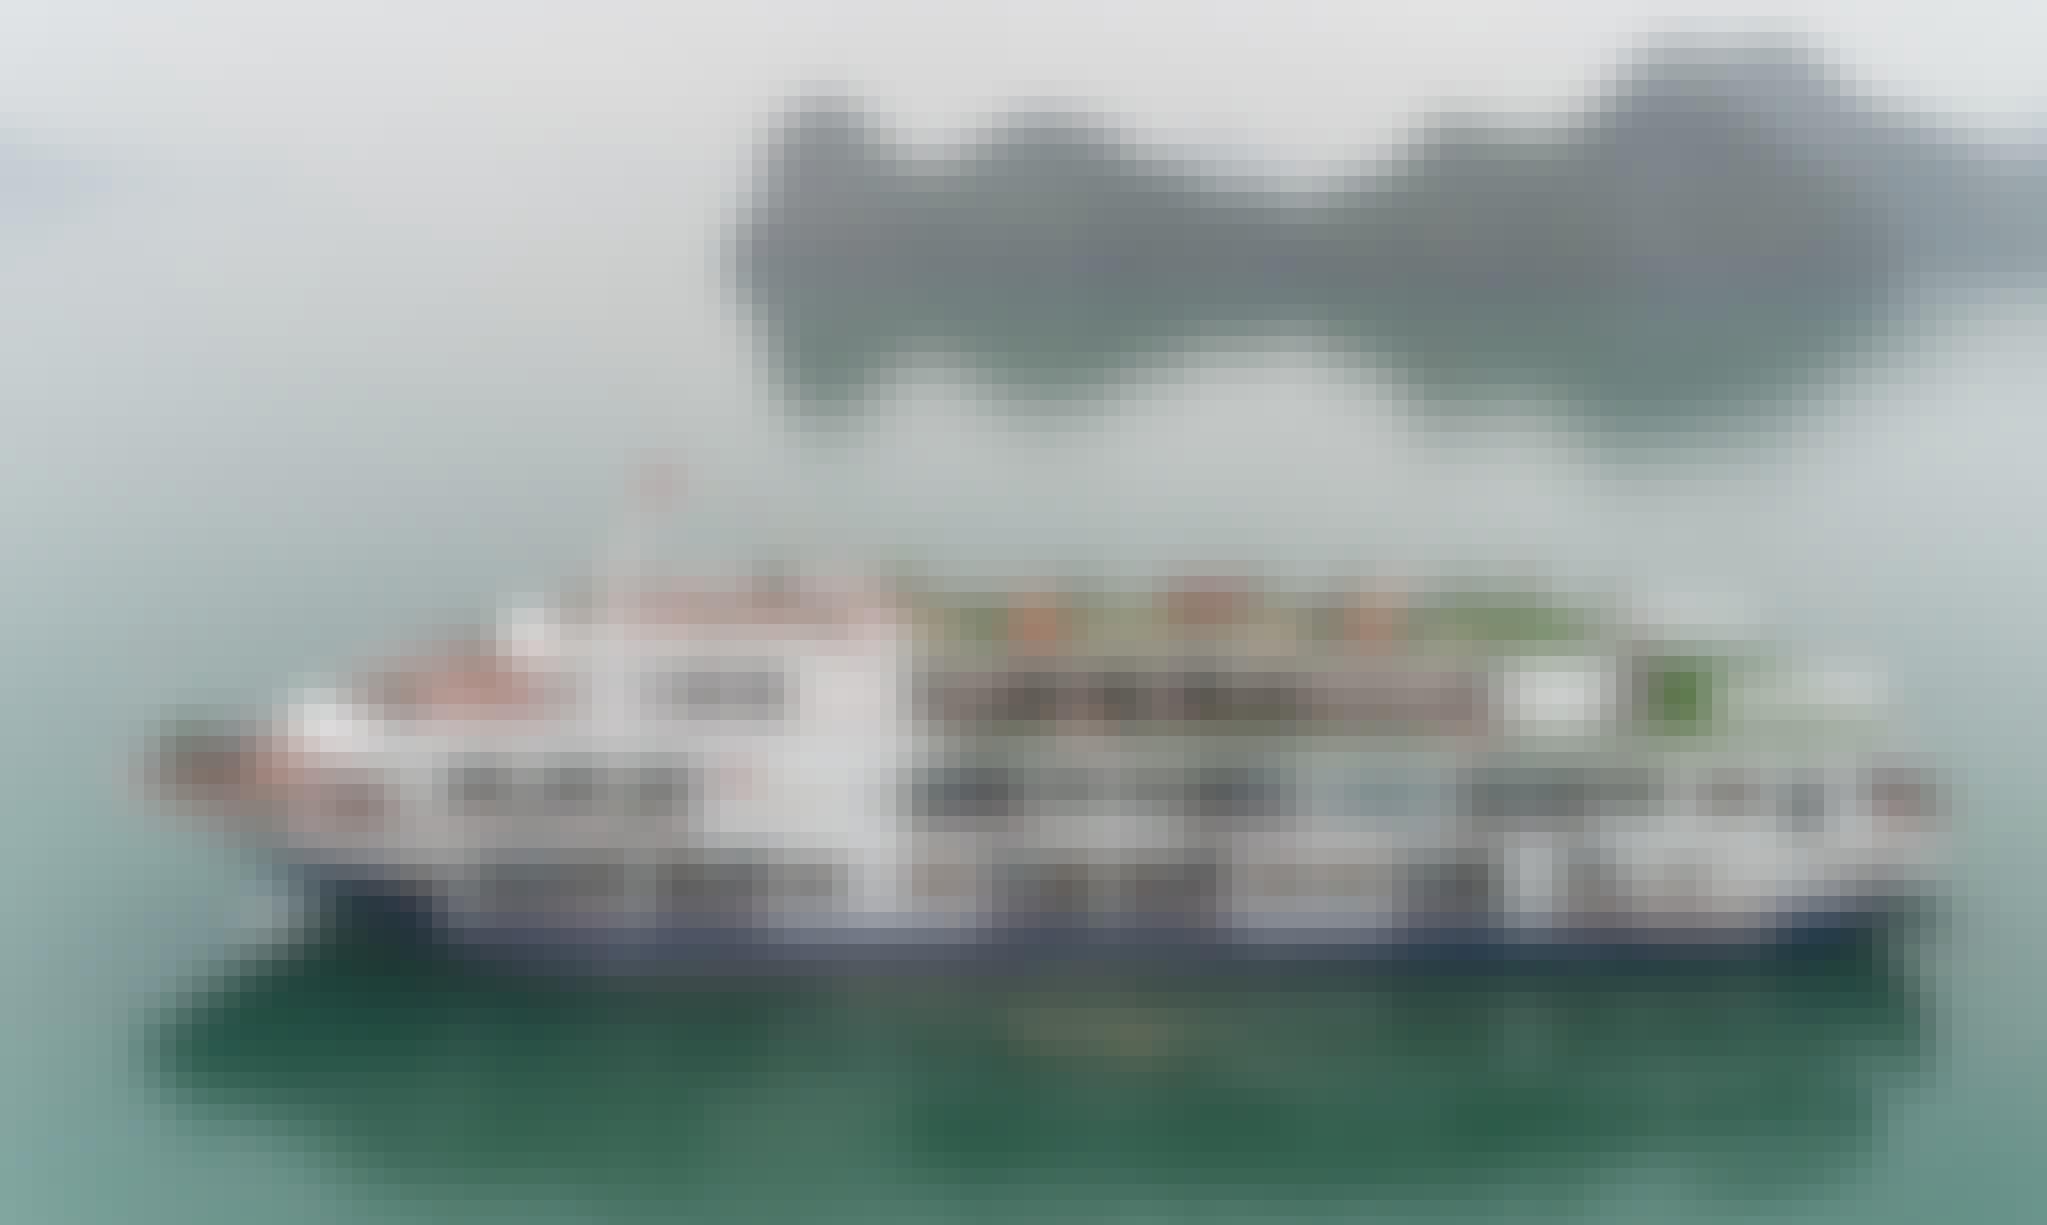 Charter a Junk Boat in Chương Dương, Vietnam